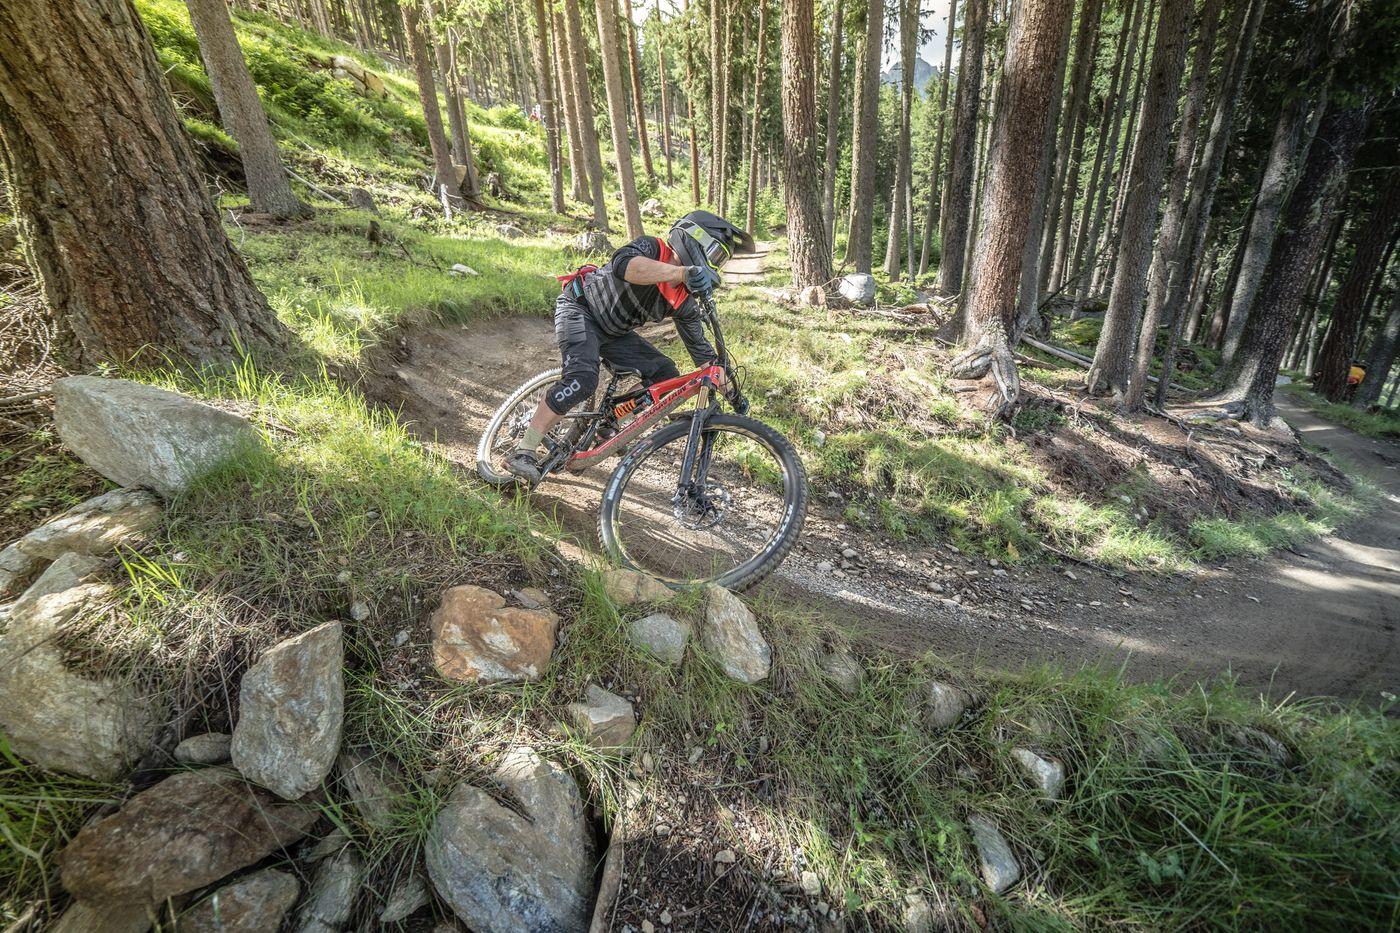 Rocky Mountain Slayer C90 Bikerepublic Sölden